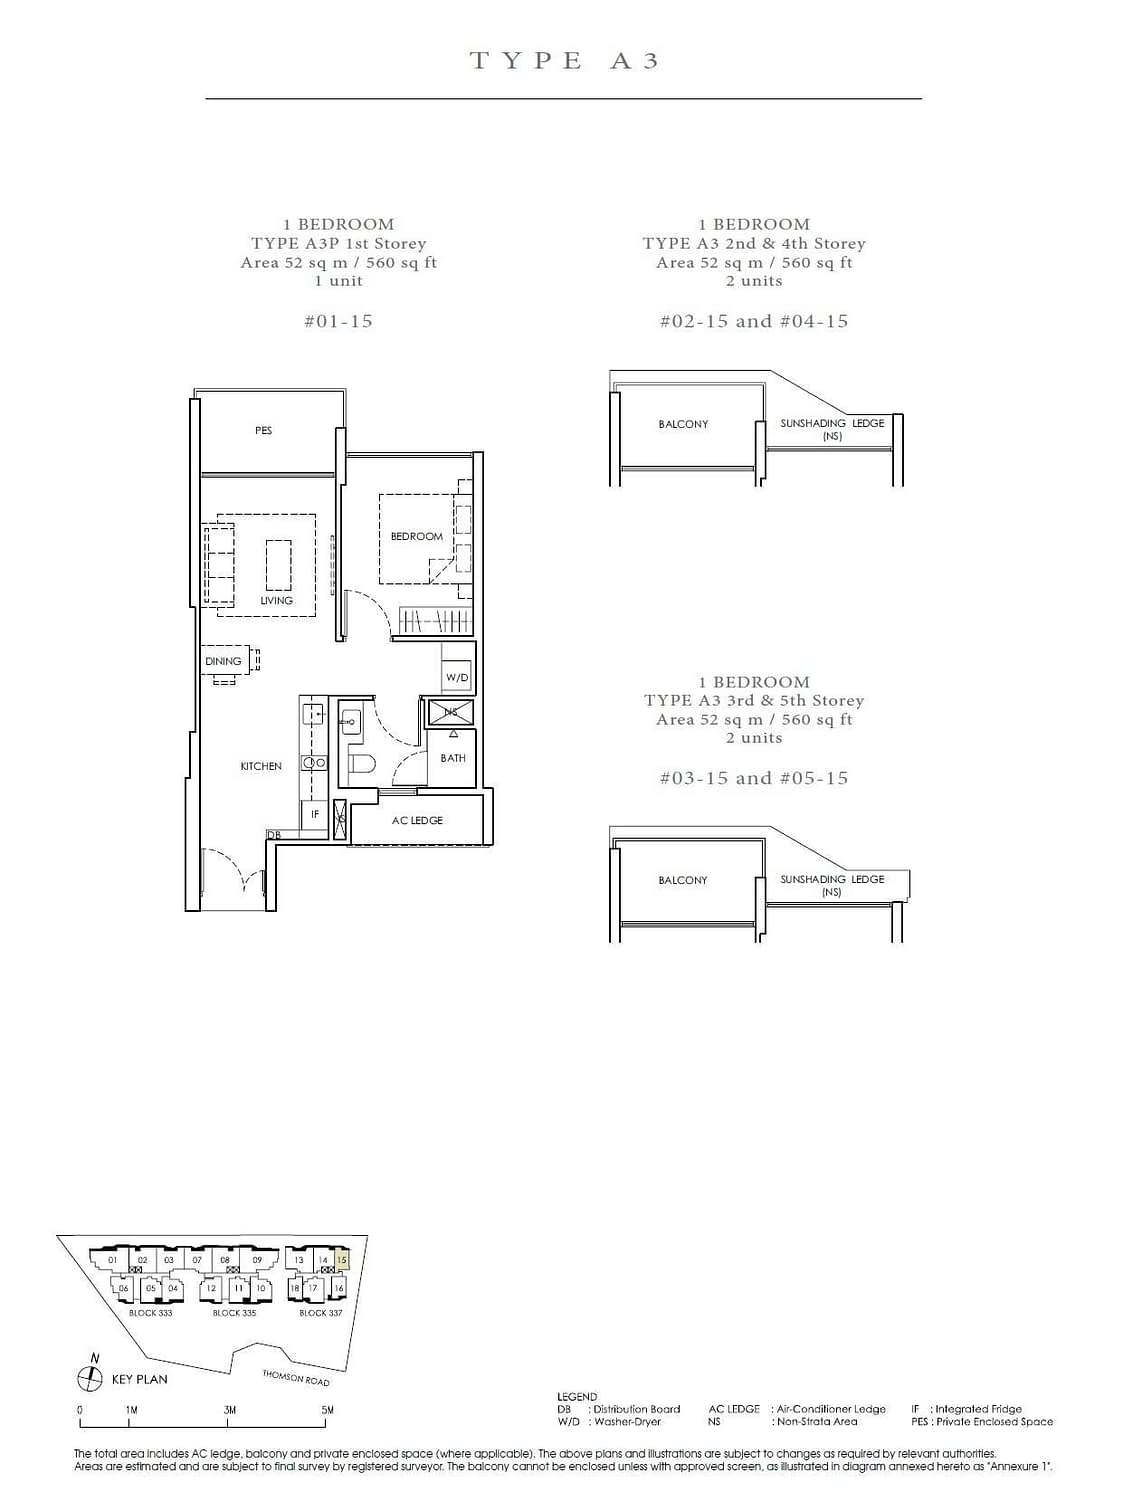 Peak Residence Peak Residence Floorplan A3